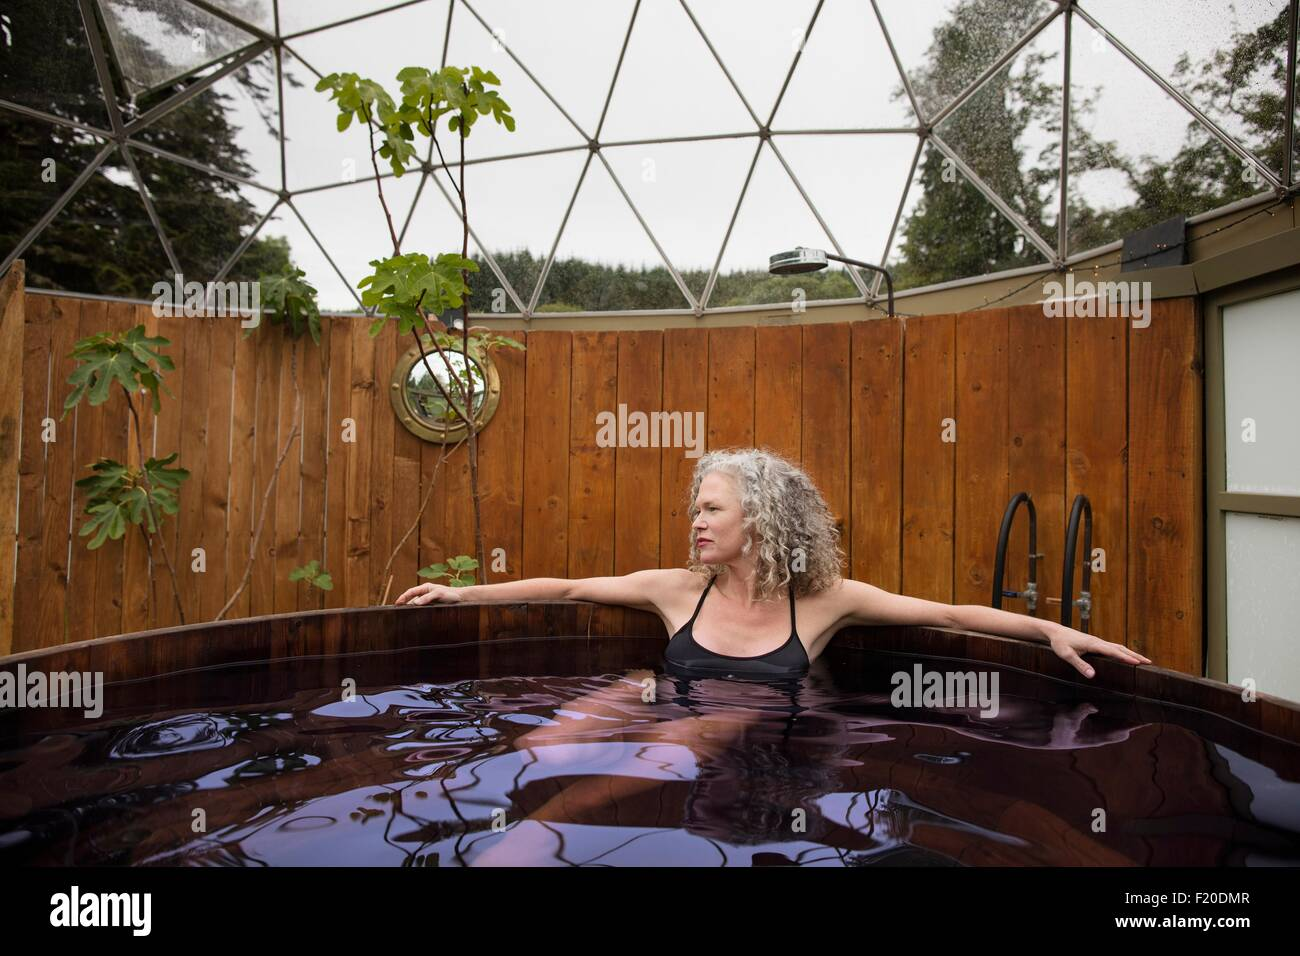 Reife Frau Entspannung im Whirlpool bei Eco retreat Stockbild